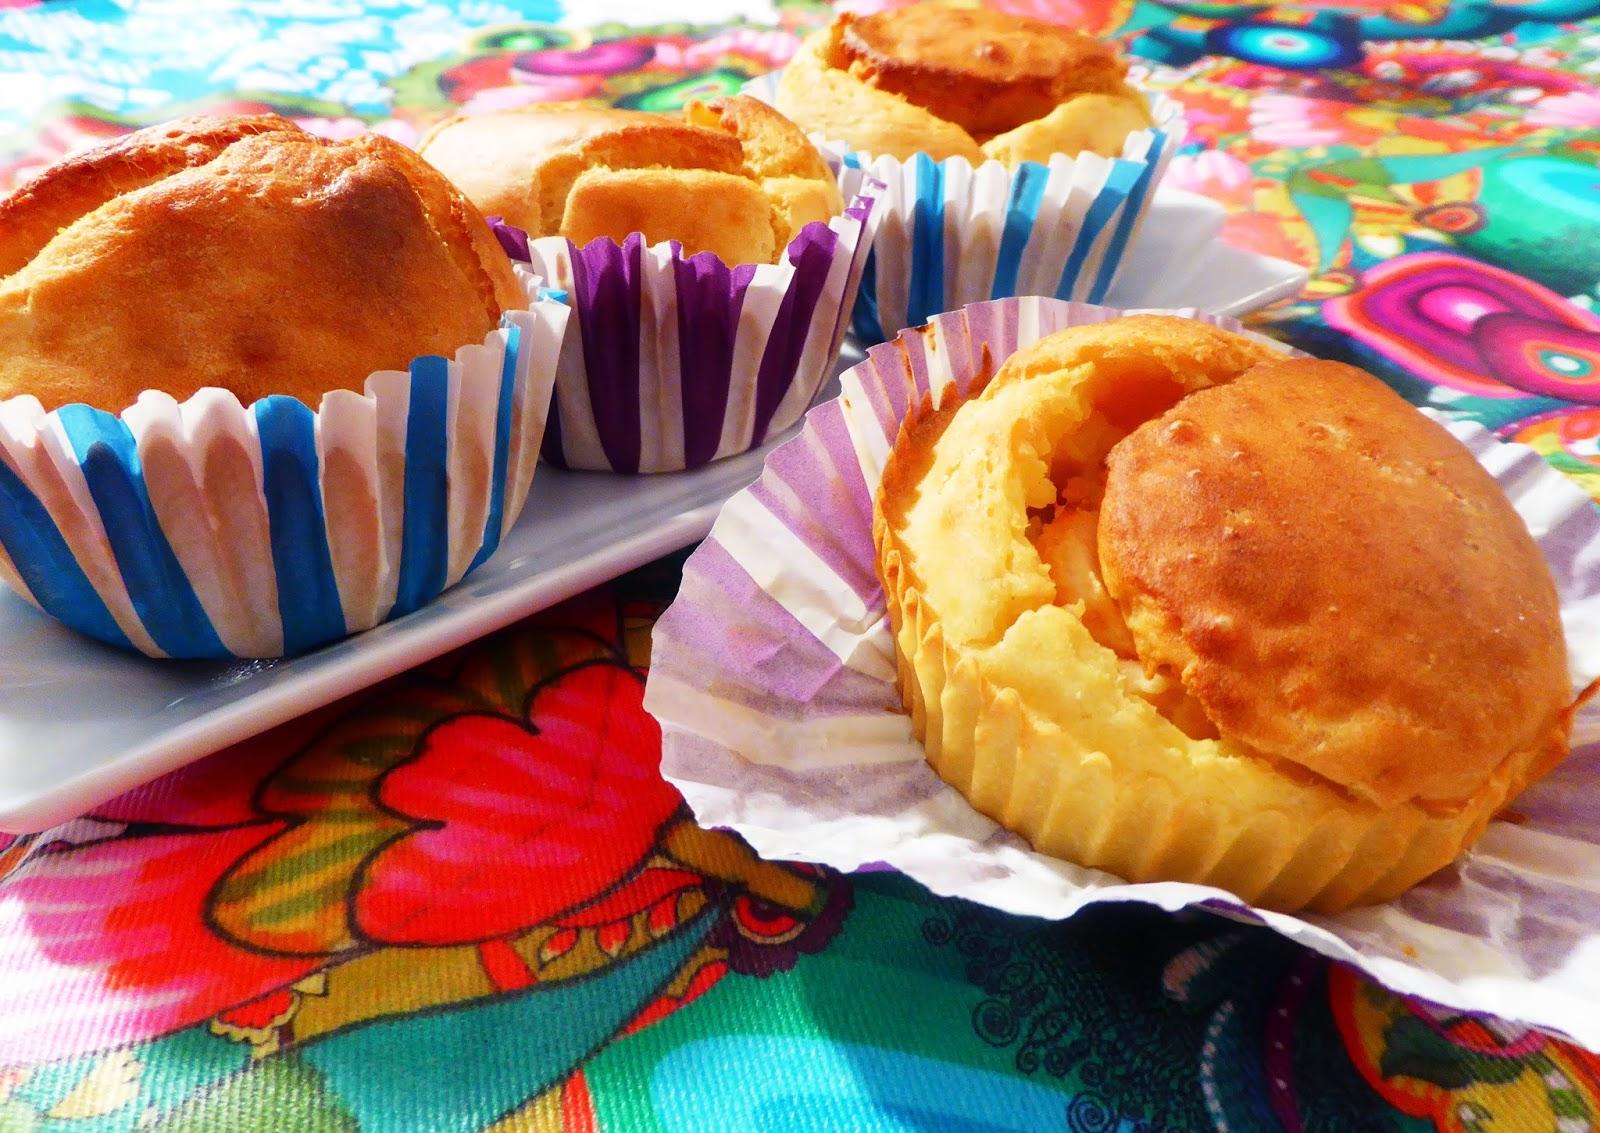 muffin di patata e salmone affumicato